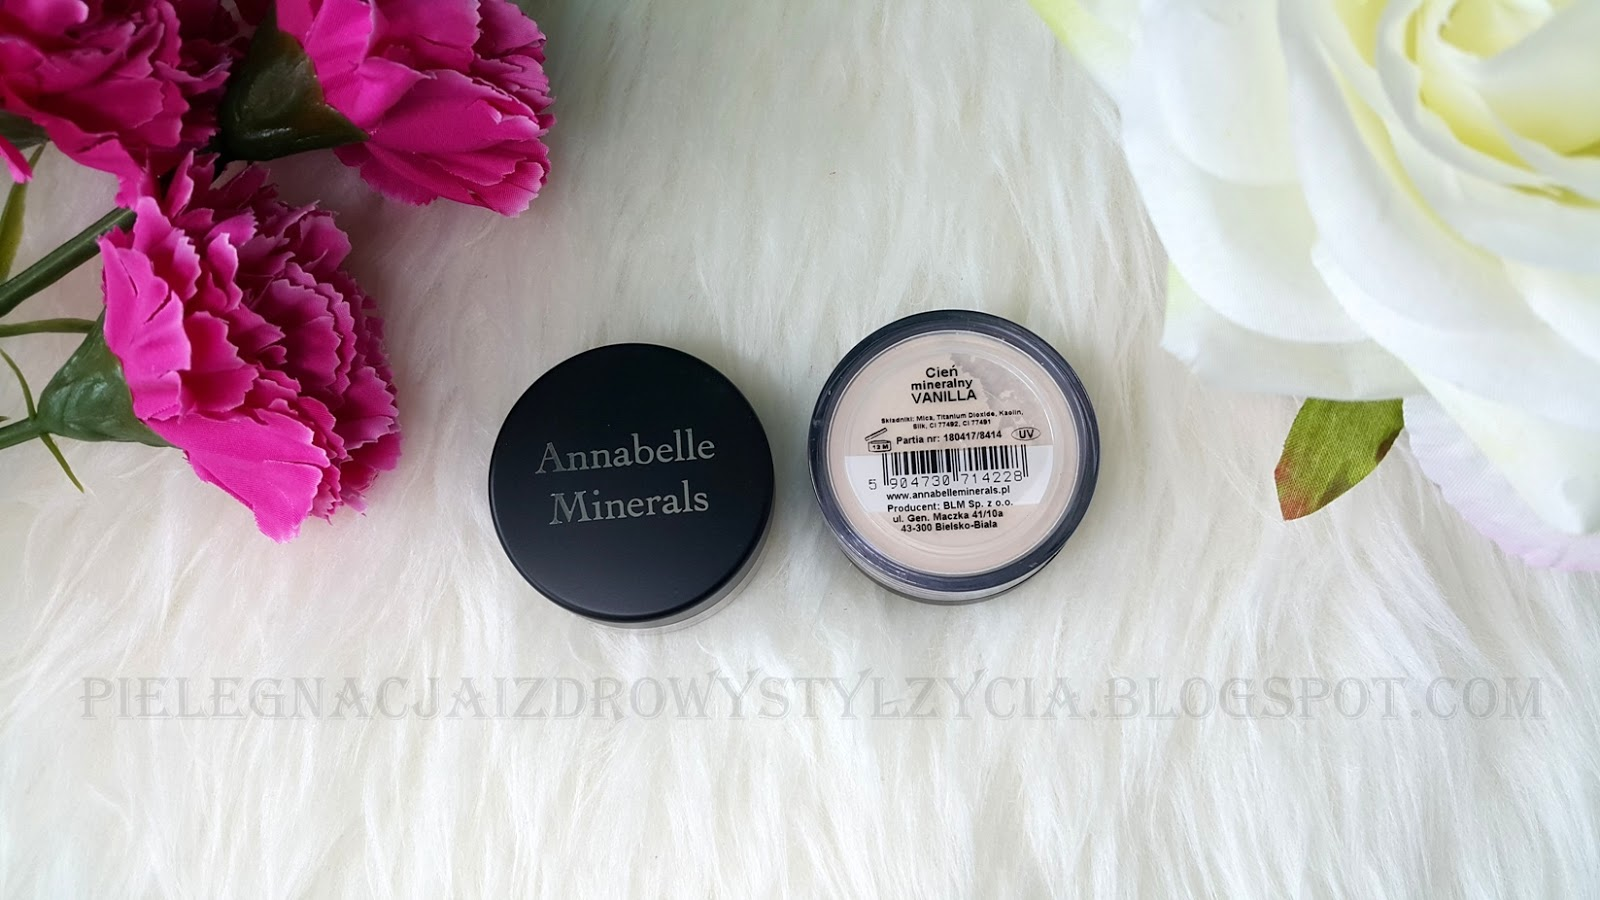 Upominki z konferencji Meet Beauty 2017 Annabelle Minerals